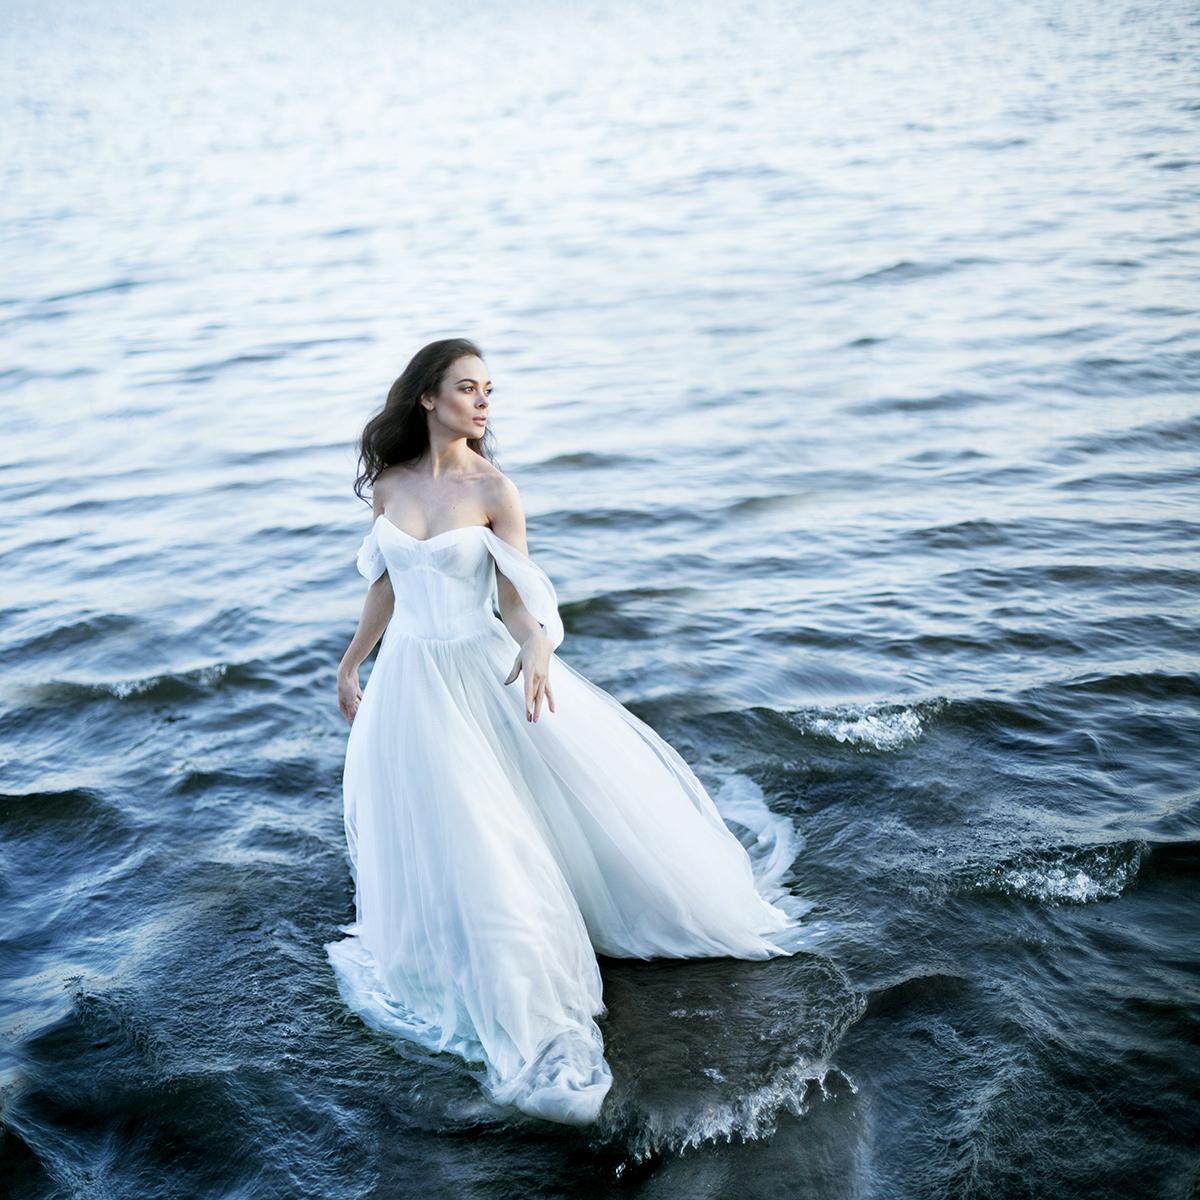 Фото Работа Бегущая по волнам, девушка в белом платье стоит на воде, фотограф Екатерина Ромакина